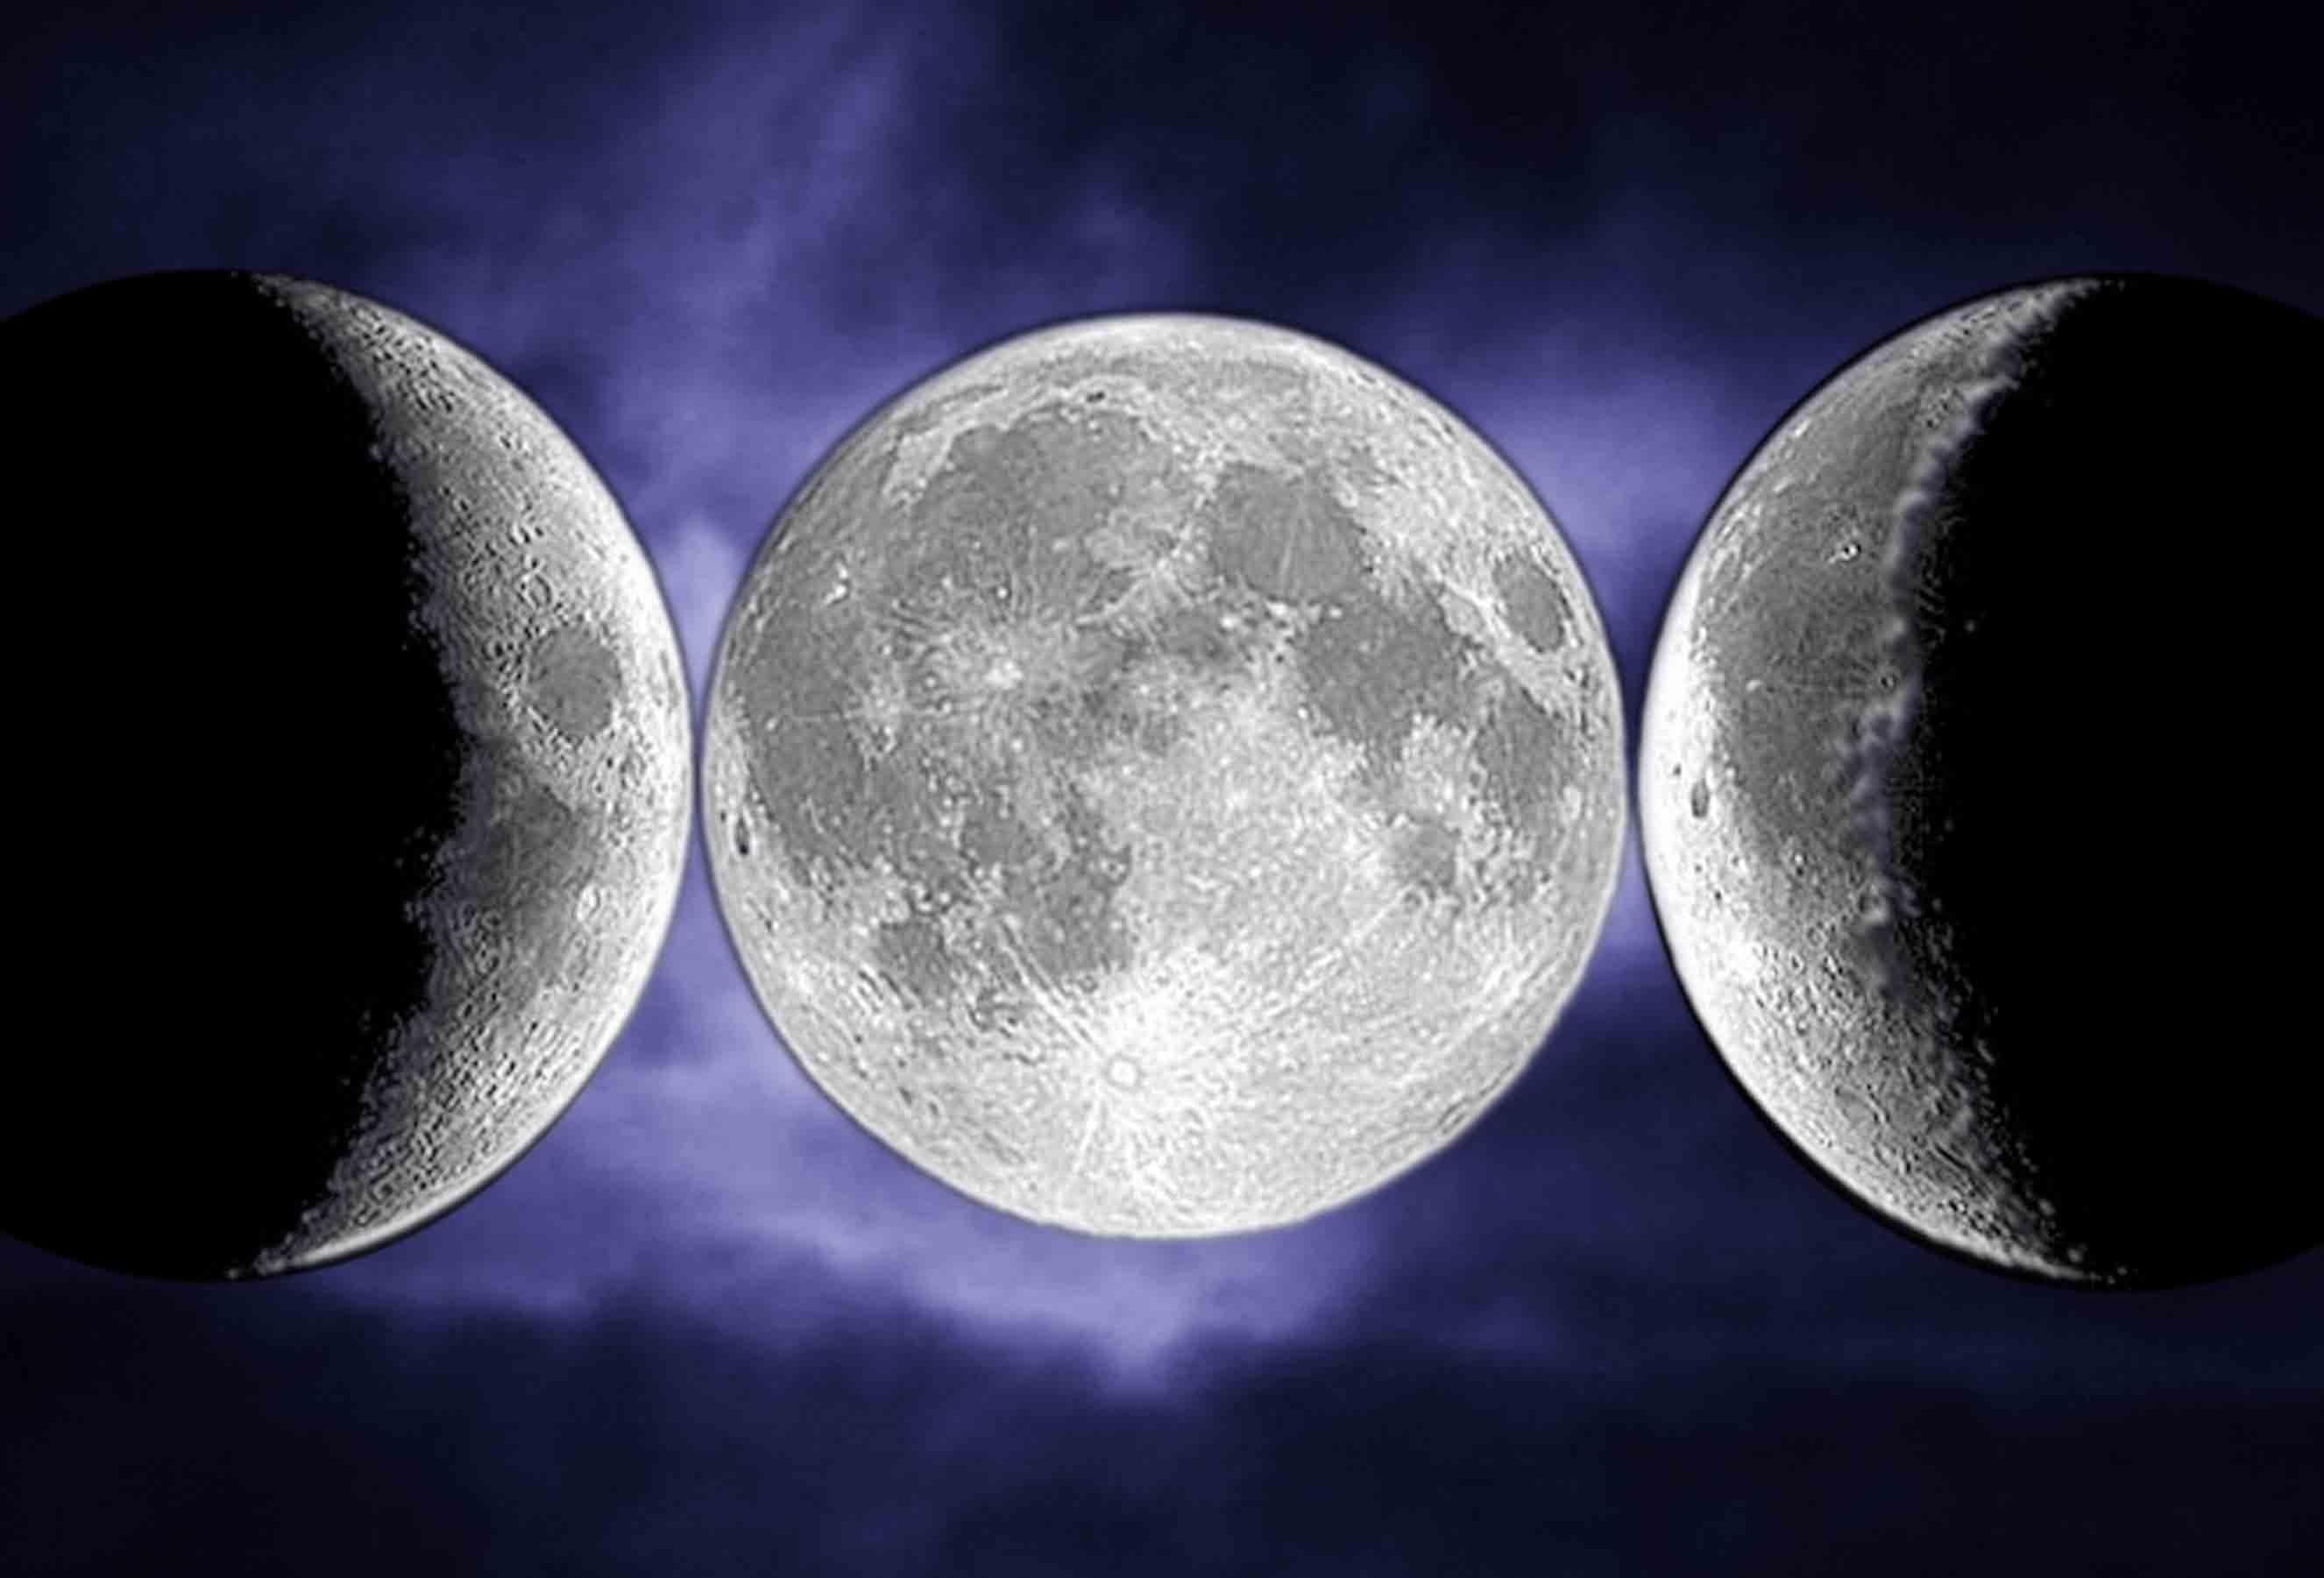 Moon As A Symbol